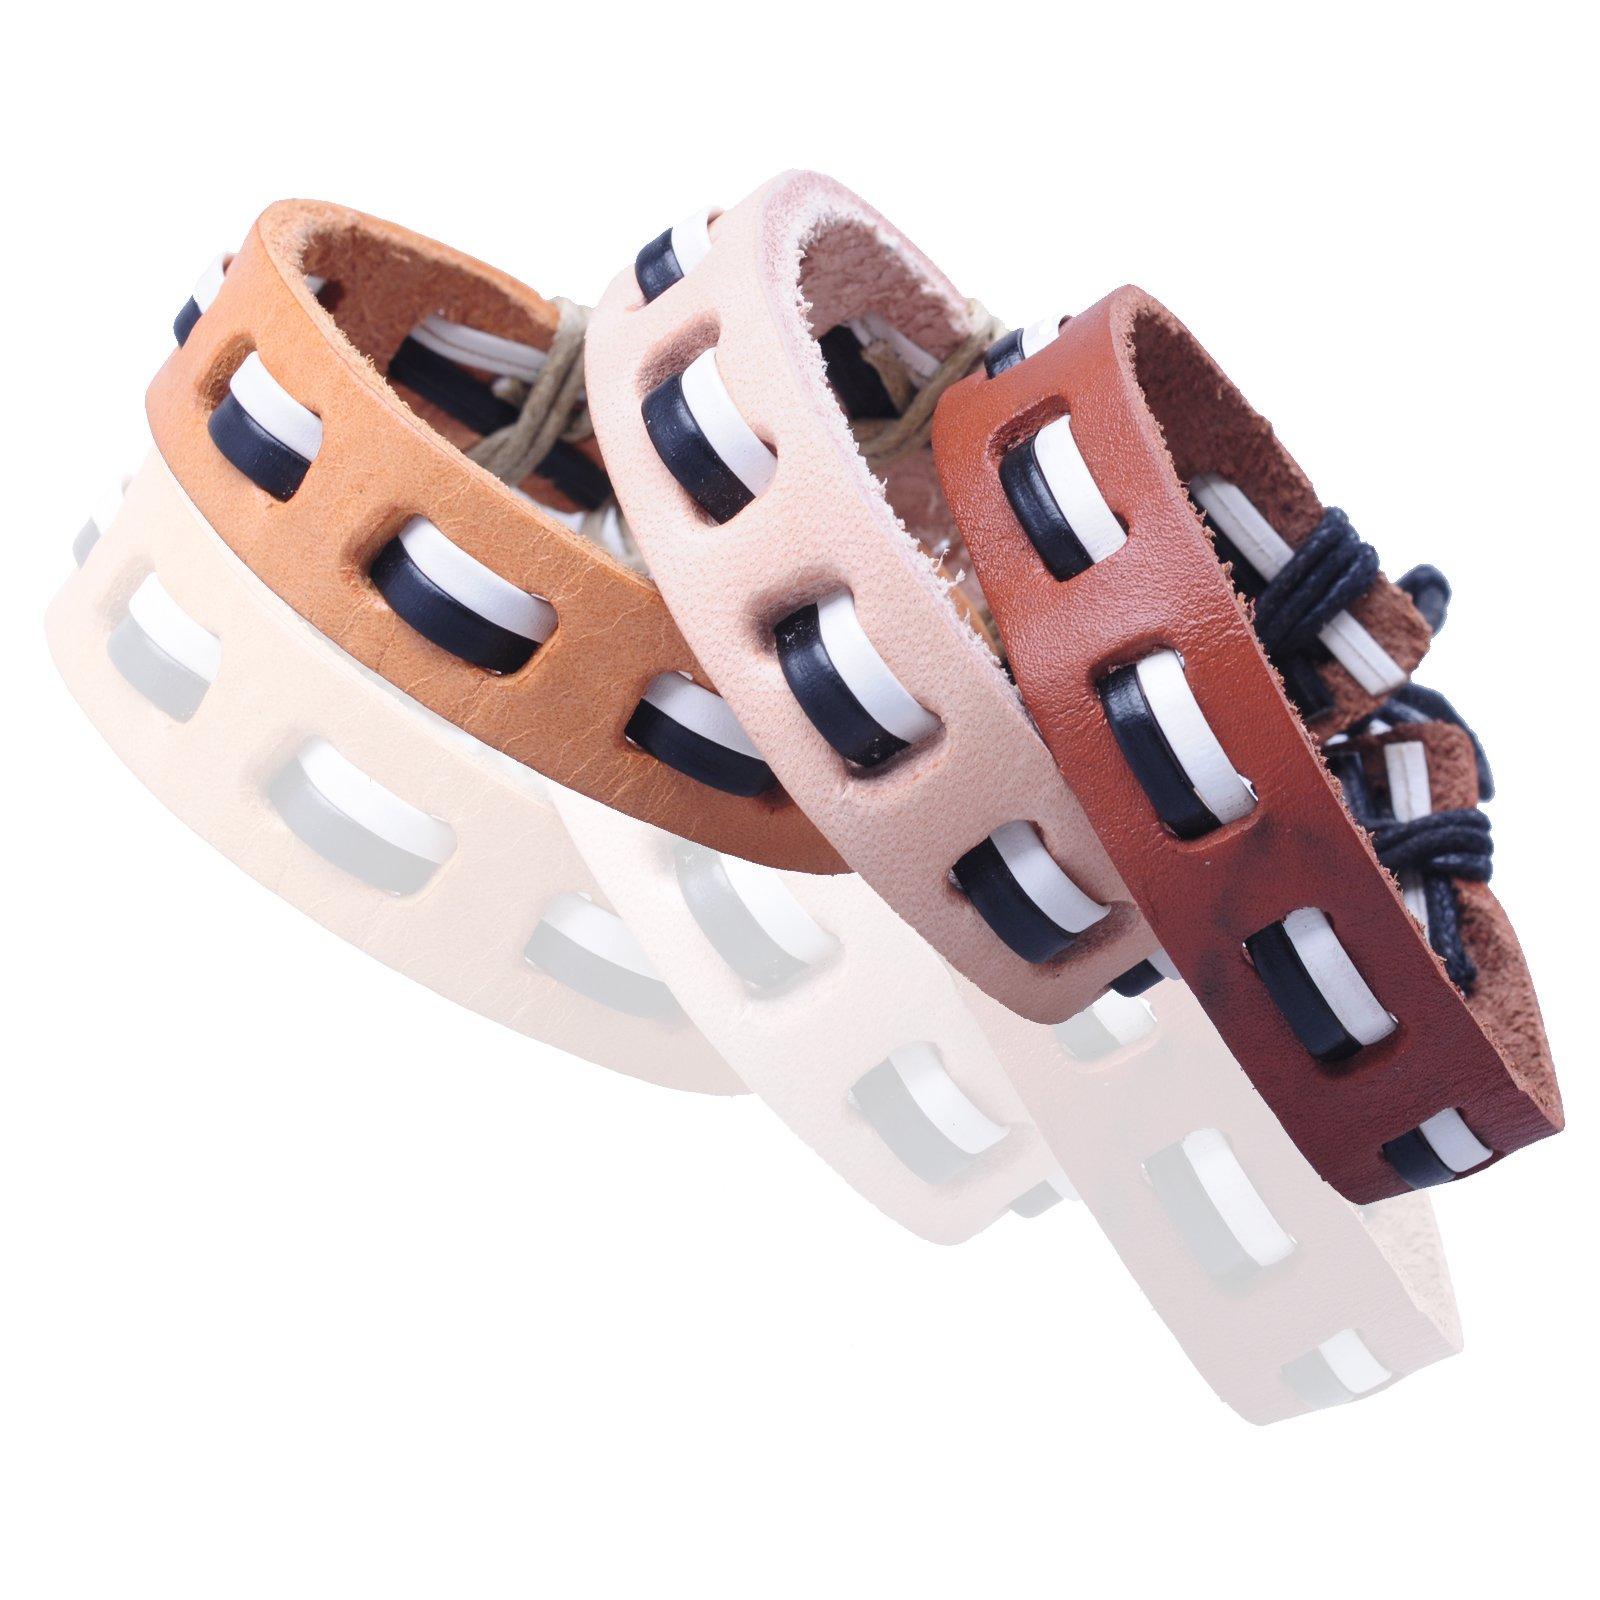 New-Fawn-Orange-Brown-Unisex-Genuine-Leather-Adjustable-Bracelets-Gift-086USANNA miniature 13